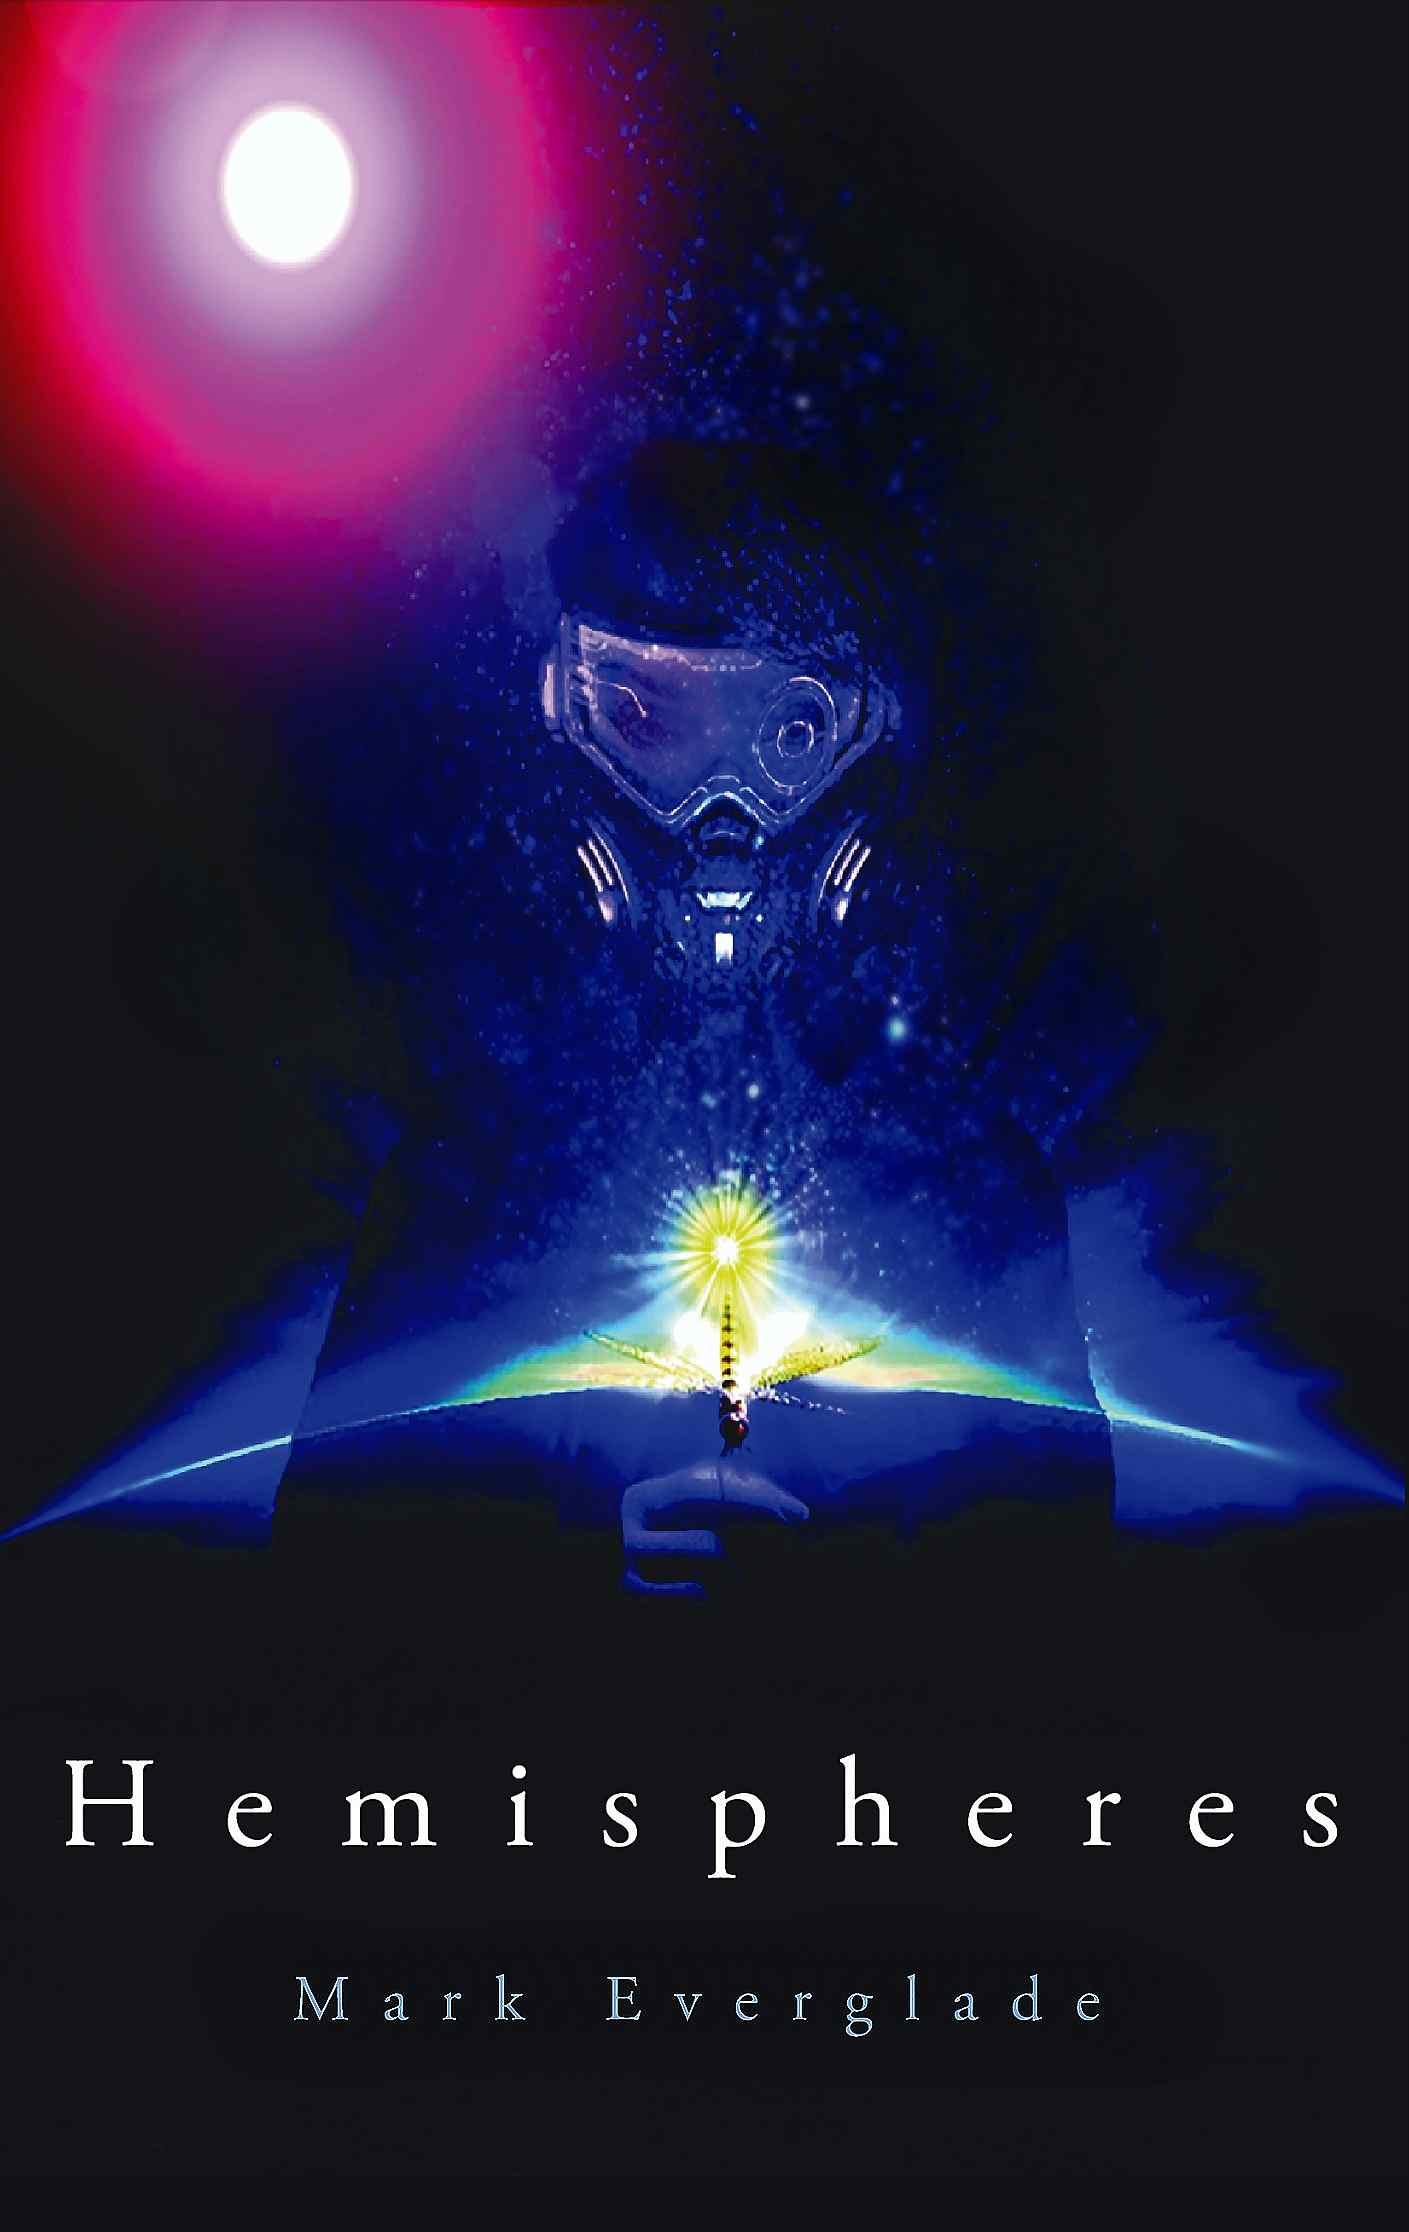 hemispheres cyberpunk book cover by mark everglade